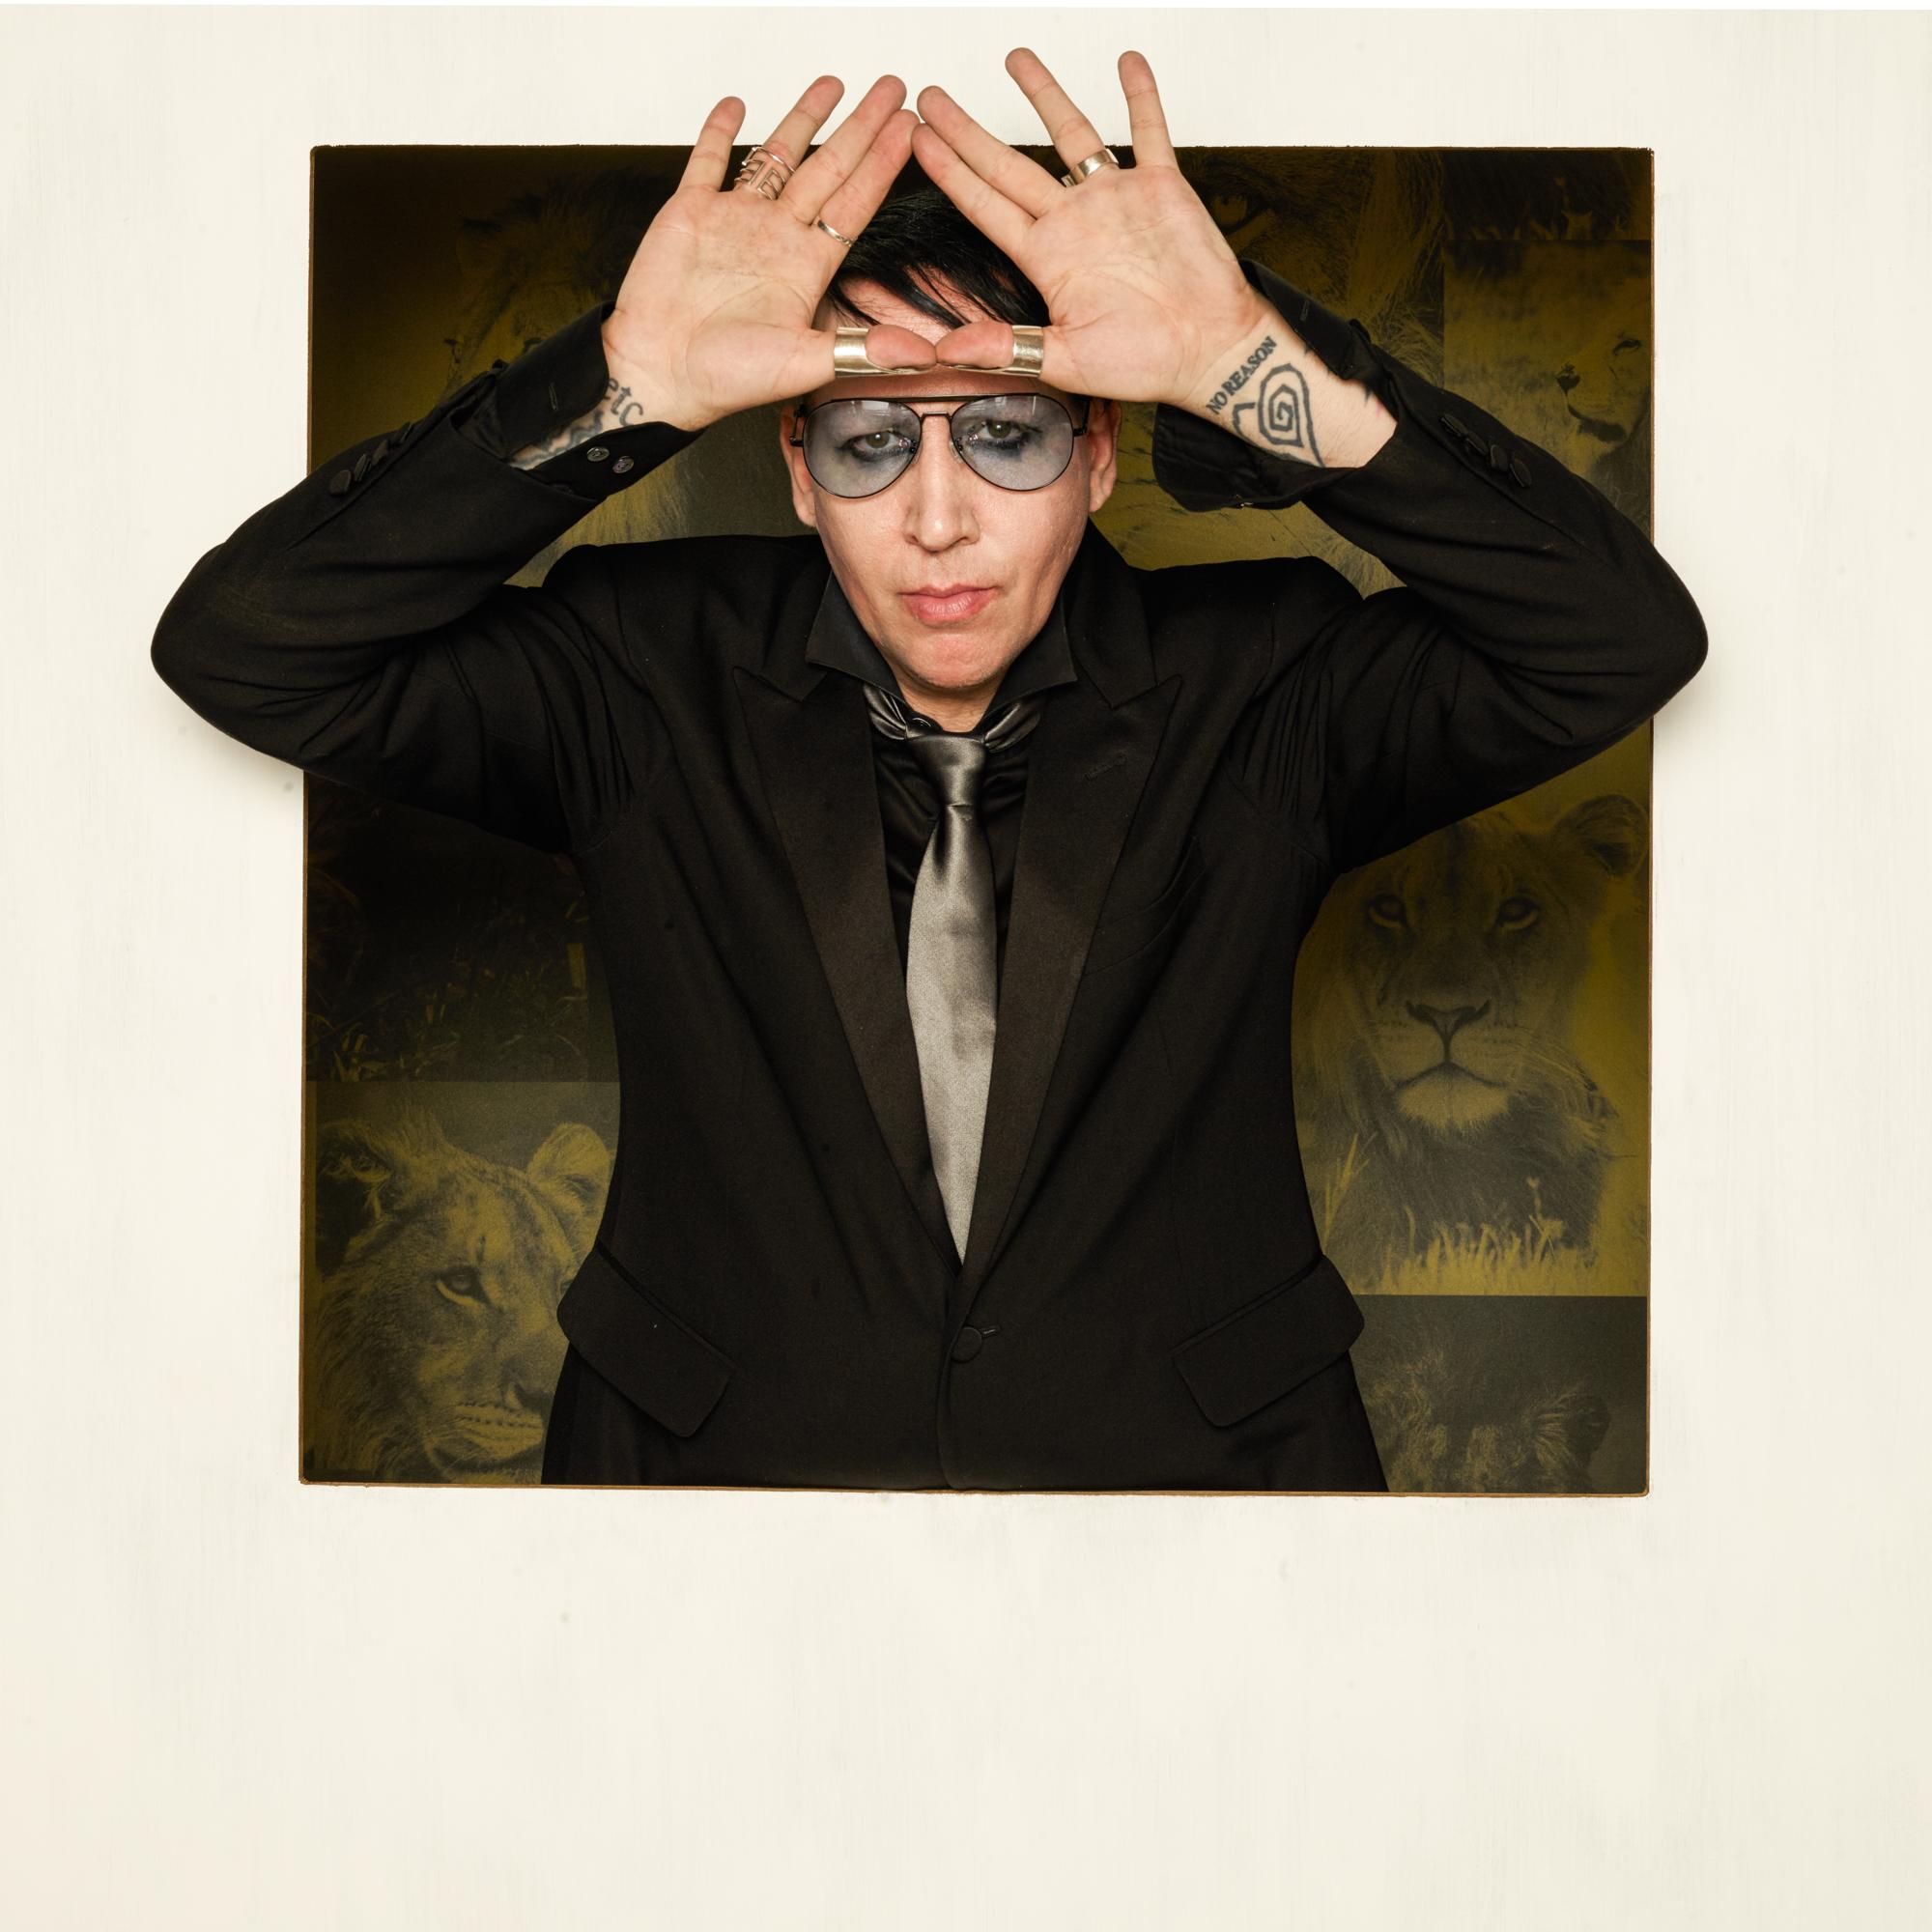 01_Marilyn_Manson_16_1.jpg